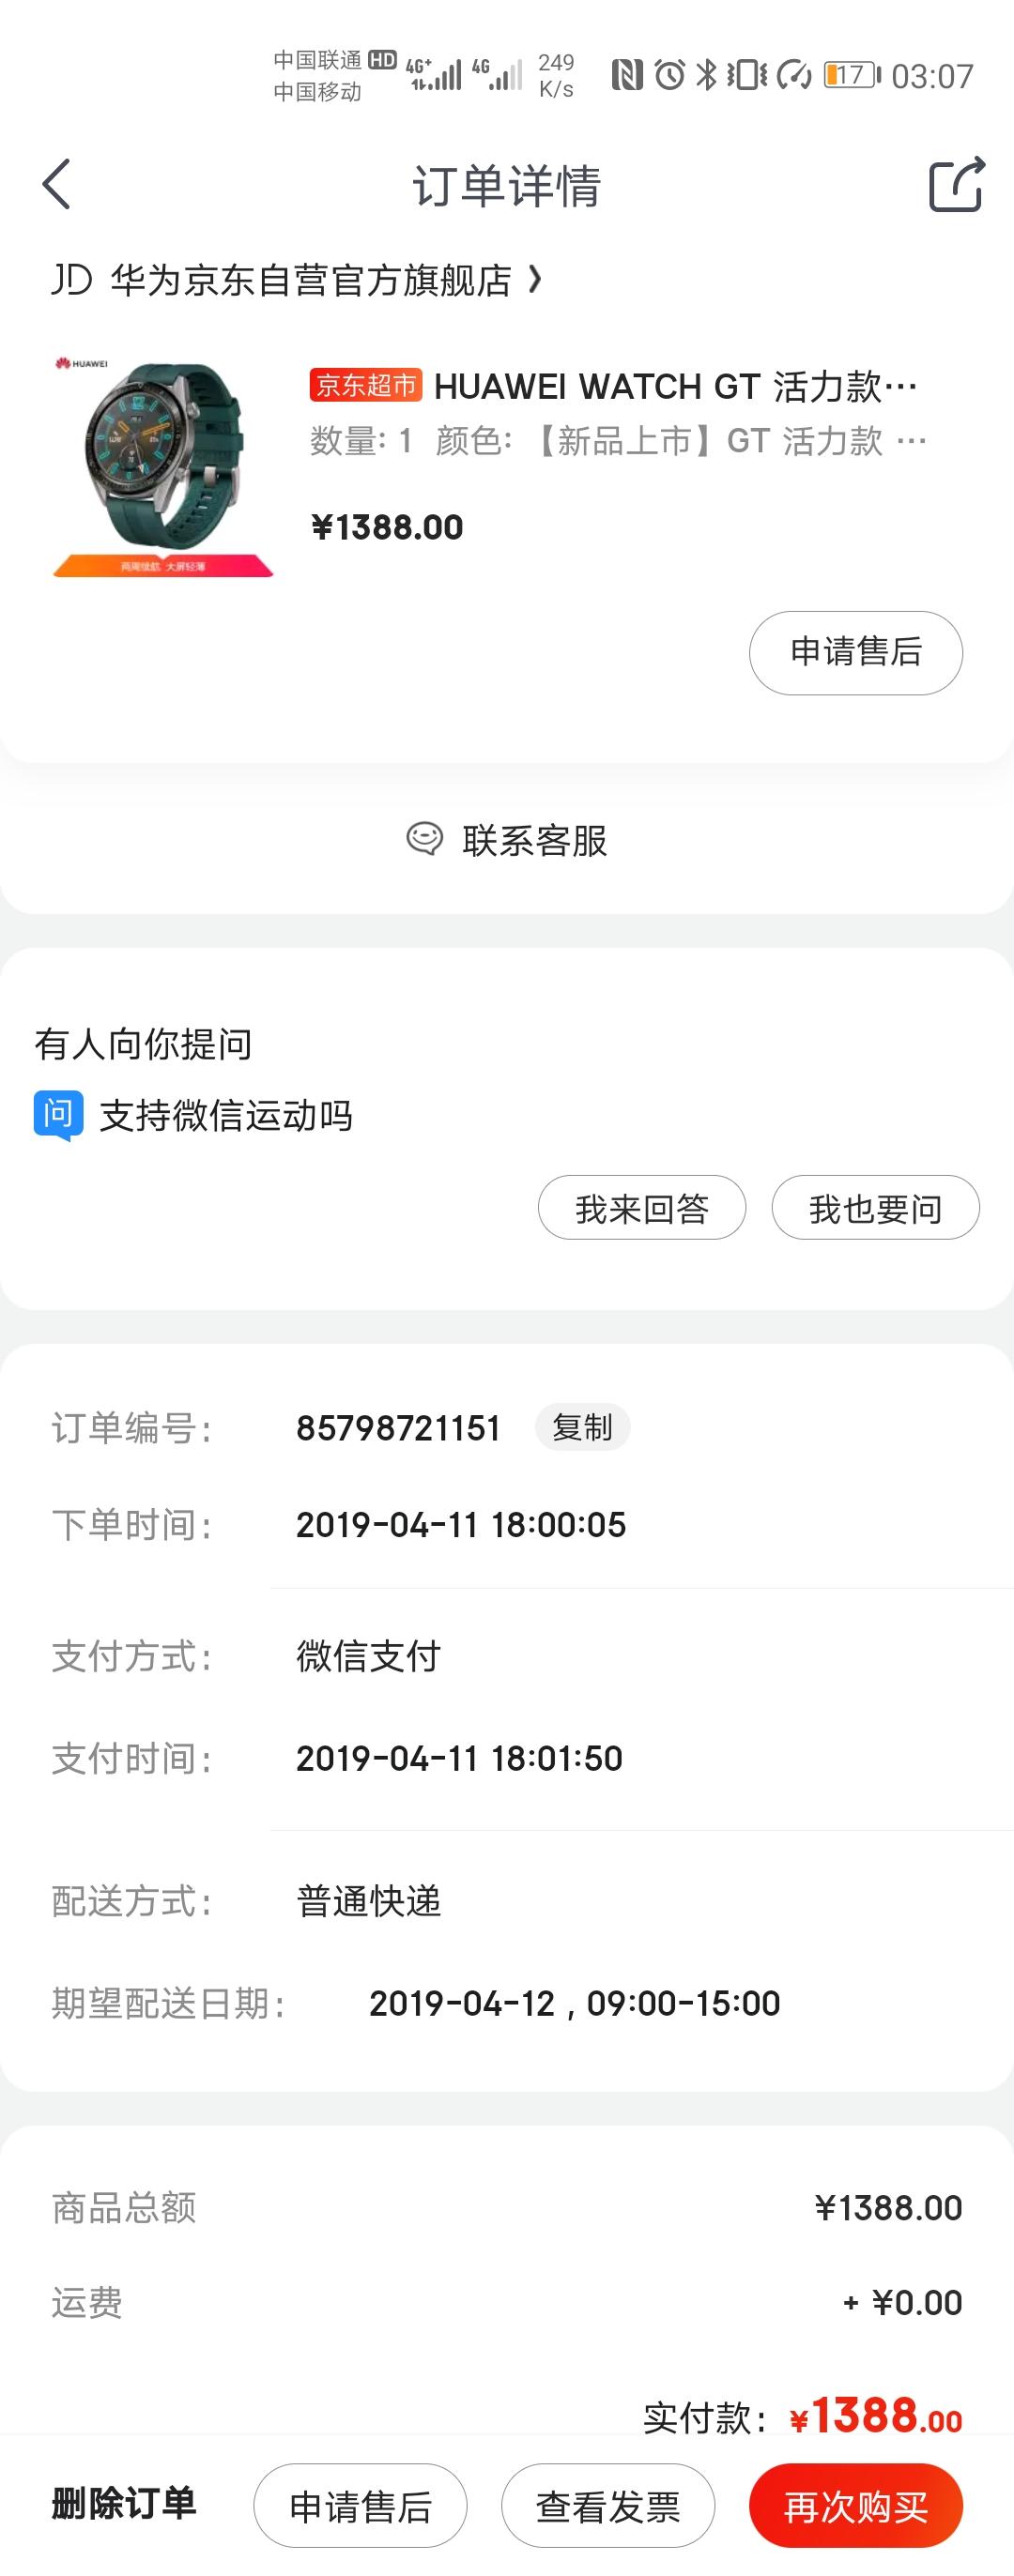 Screenshot_20200426_030726_com.jingdong.app.mall.jpg